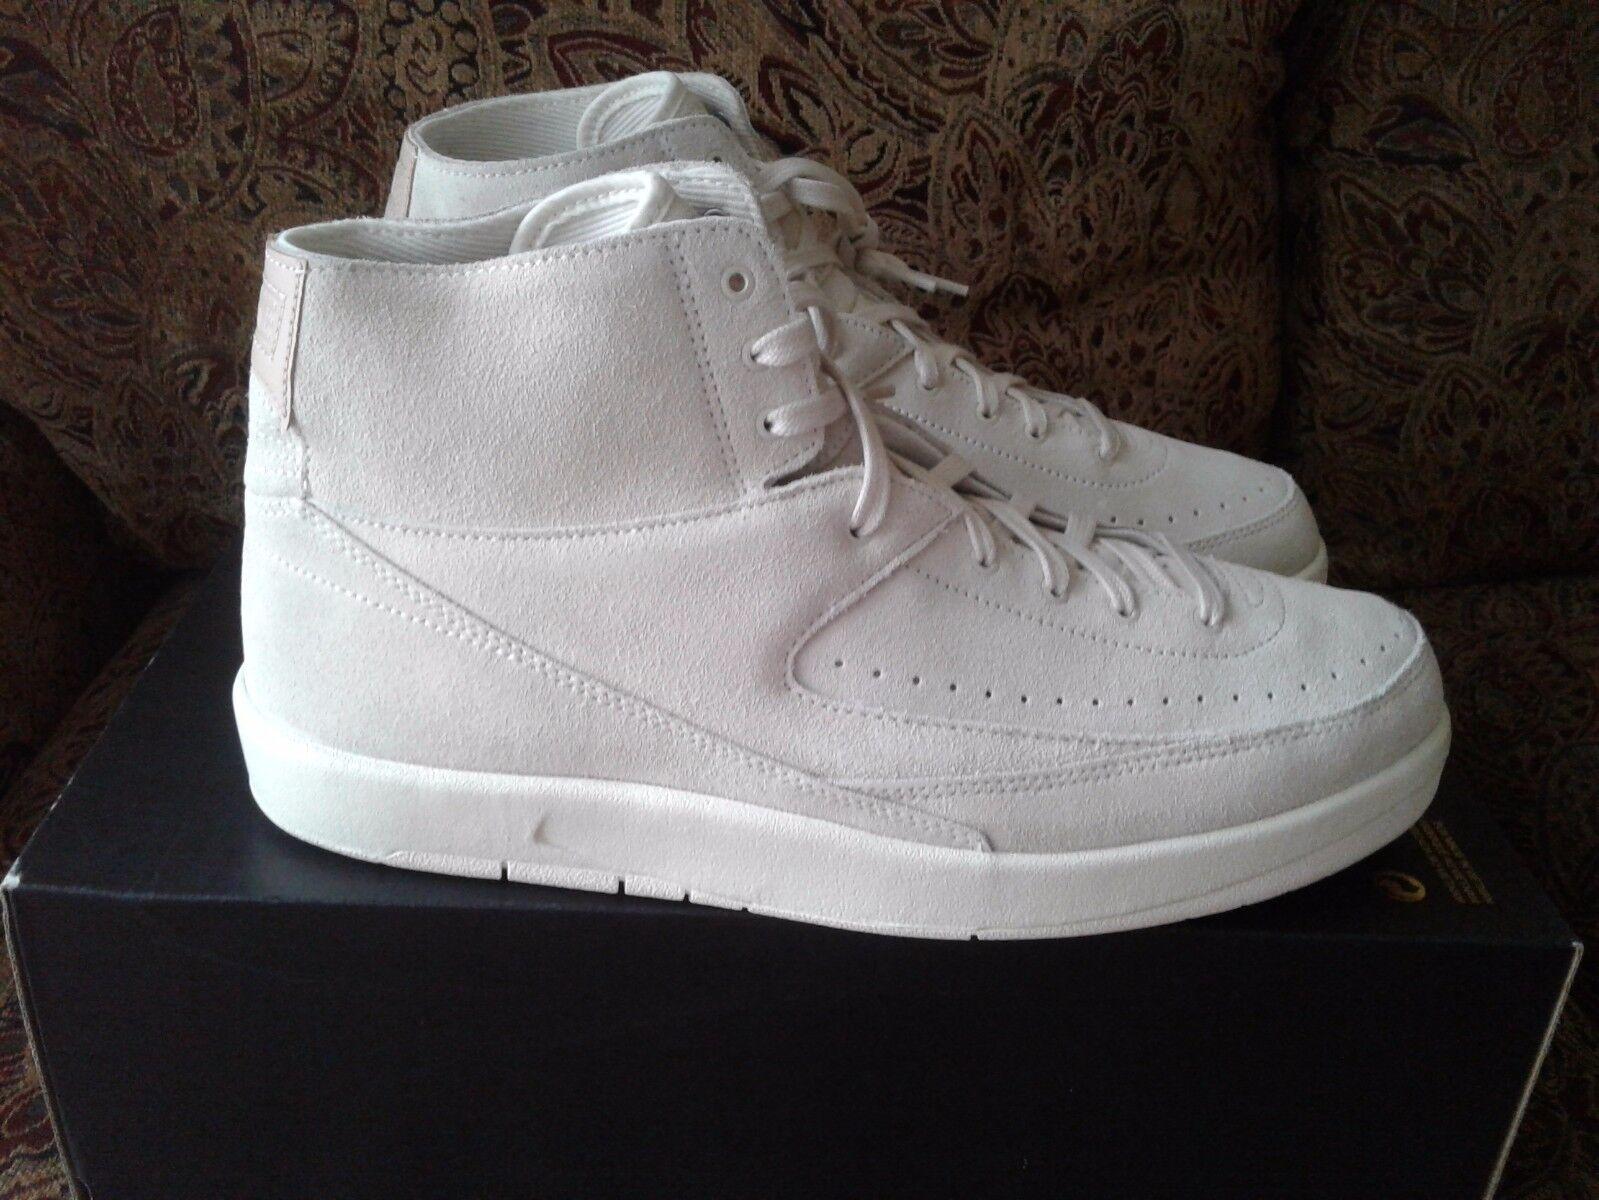 Nike Air Jordan 2 Retro Decon Beige Suede 897521-100 Size 11